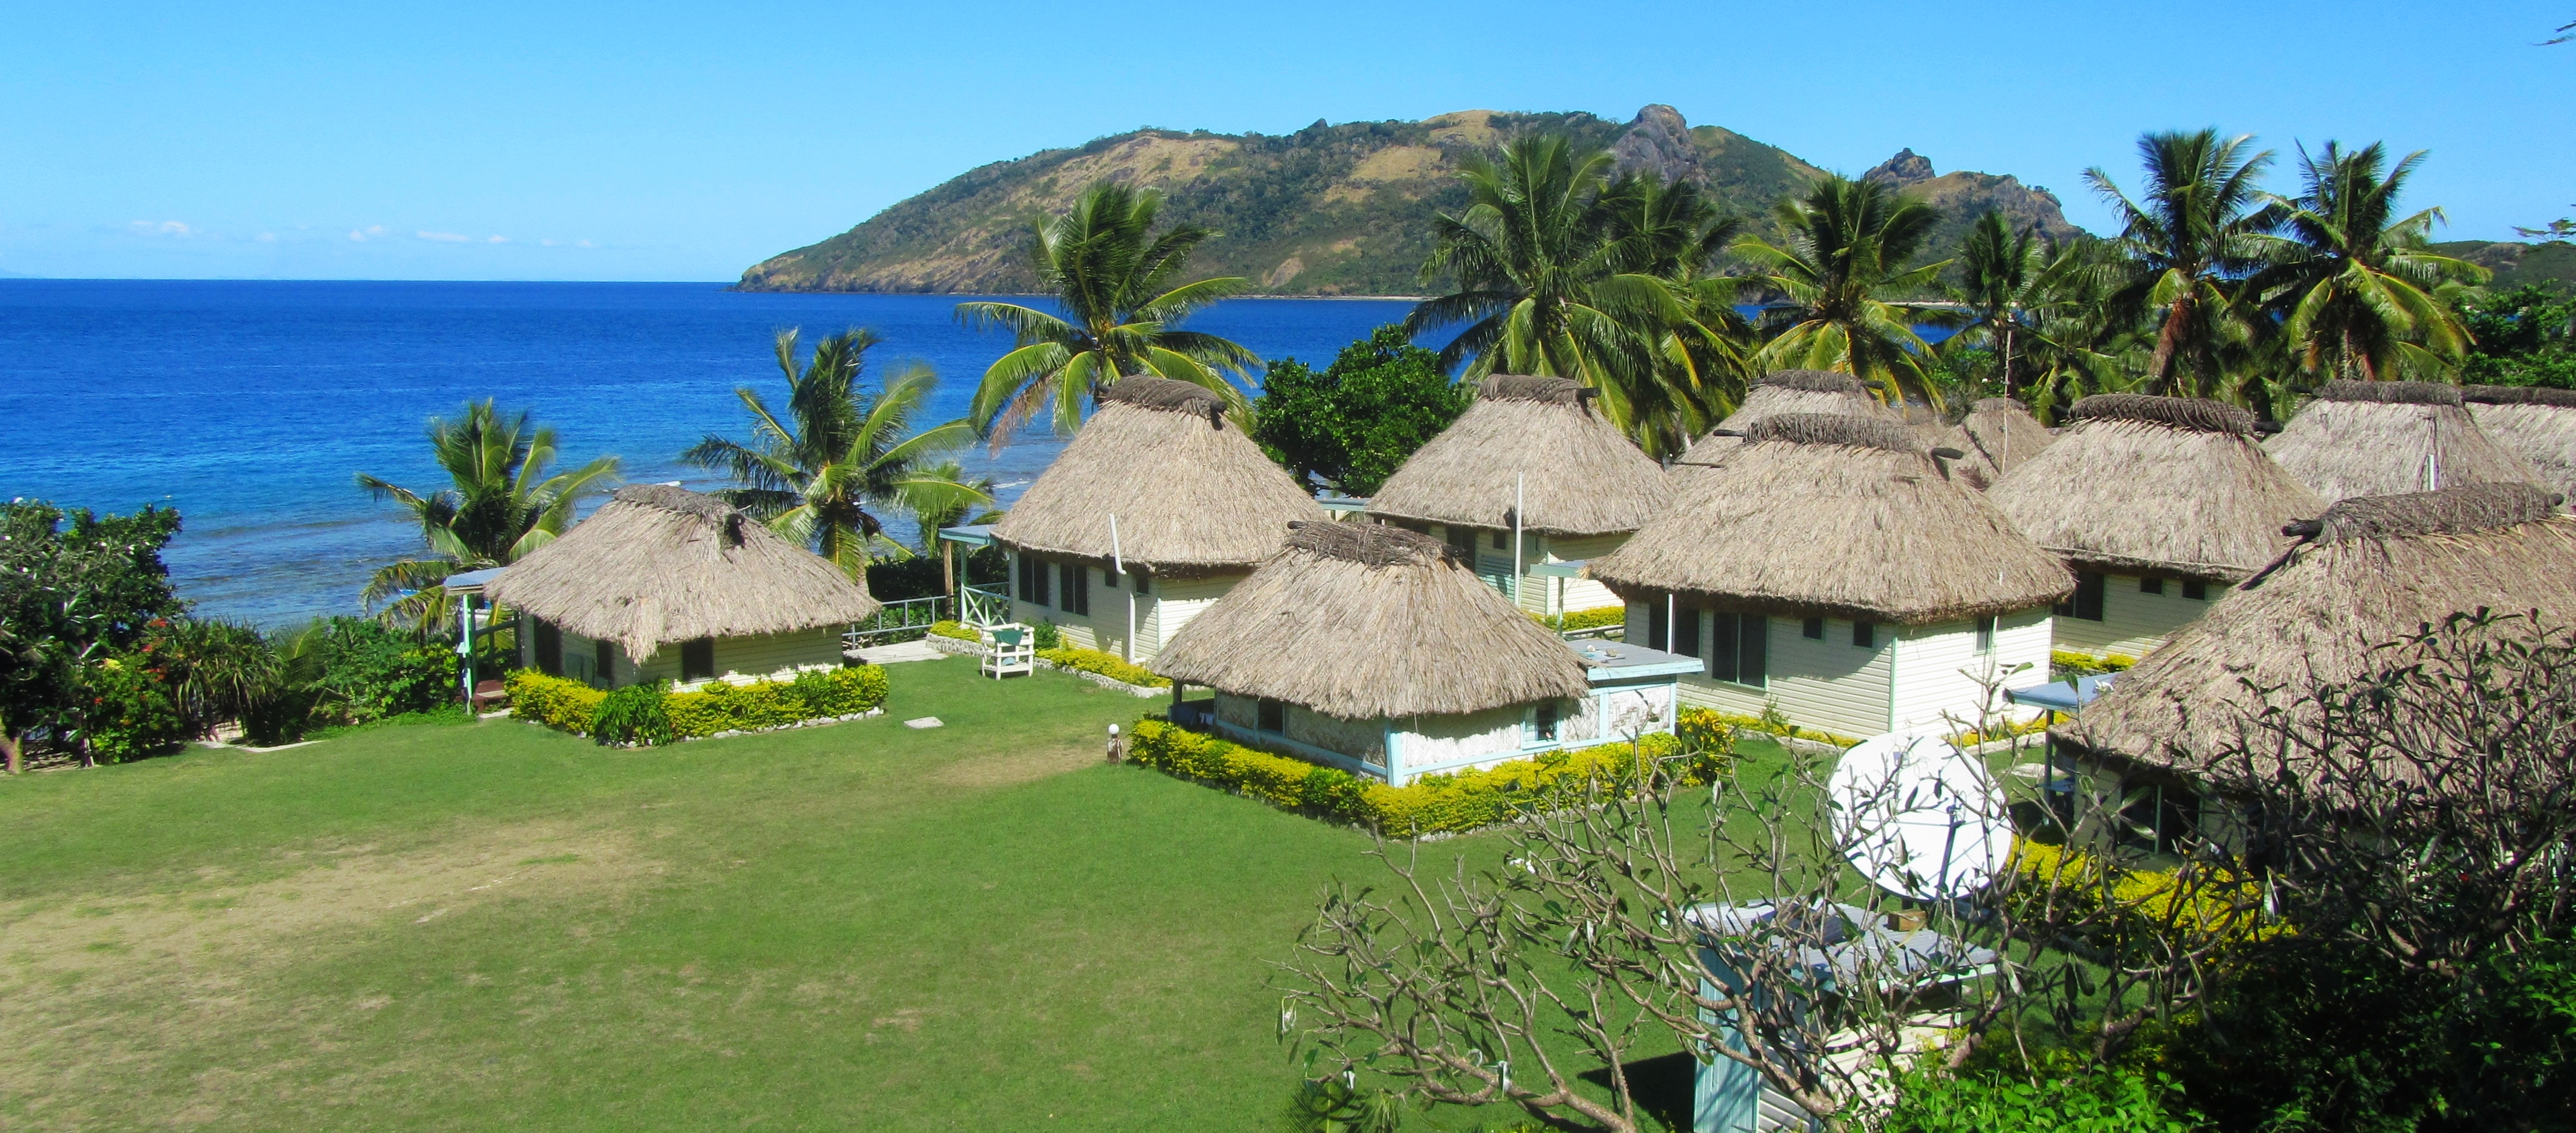 Bula! And Welcome to Fiji